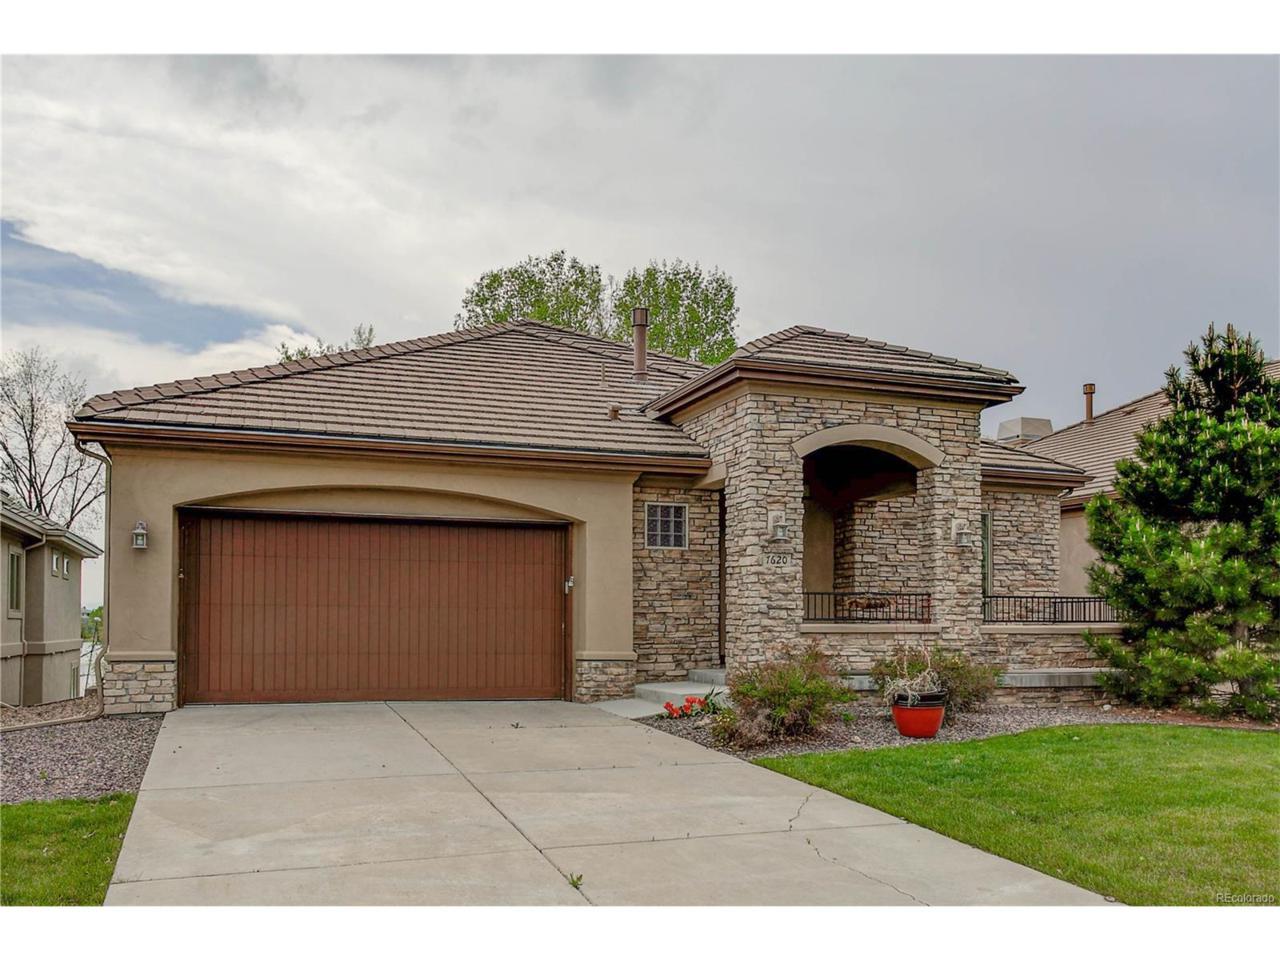 7620 W Grand Avenue, Lakewood, CO 80123 (MLS #1657045) :: 8z Real Estate